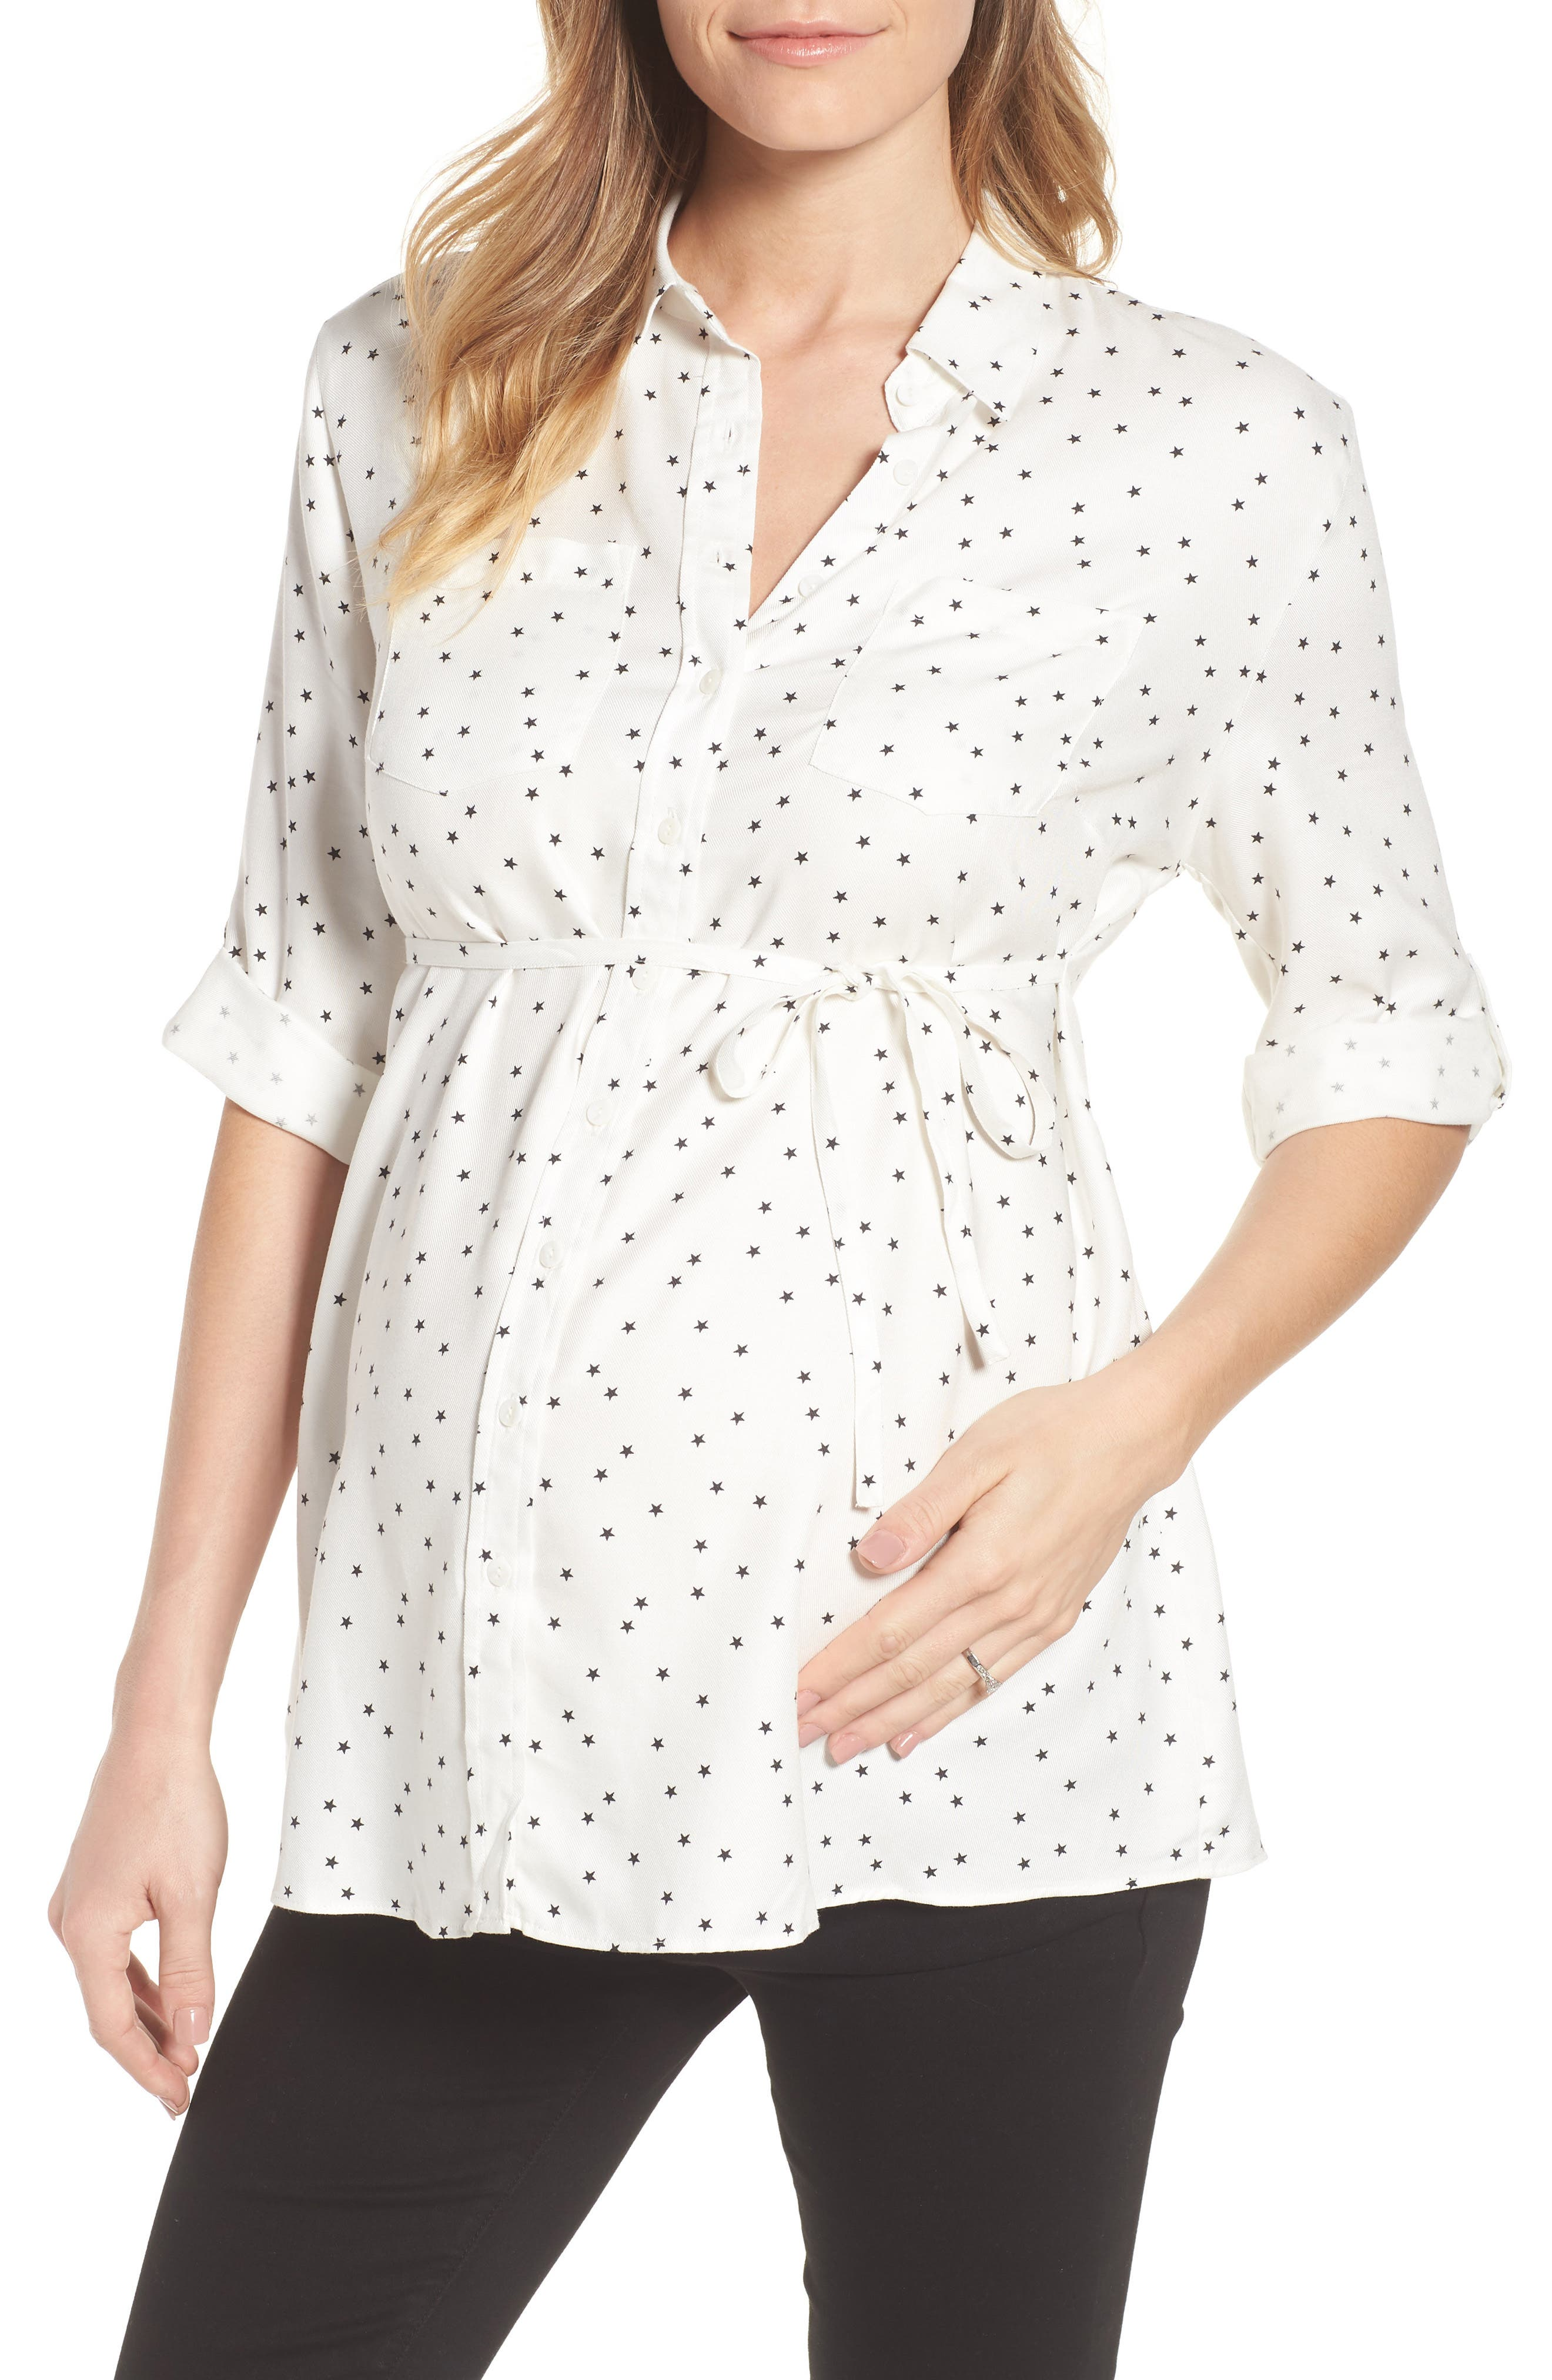 Selina Maternity Shirt,                             Main thumbnail 1, color,                             Off White Star Print